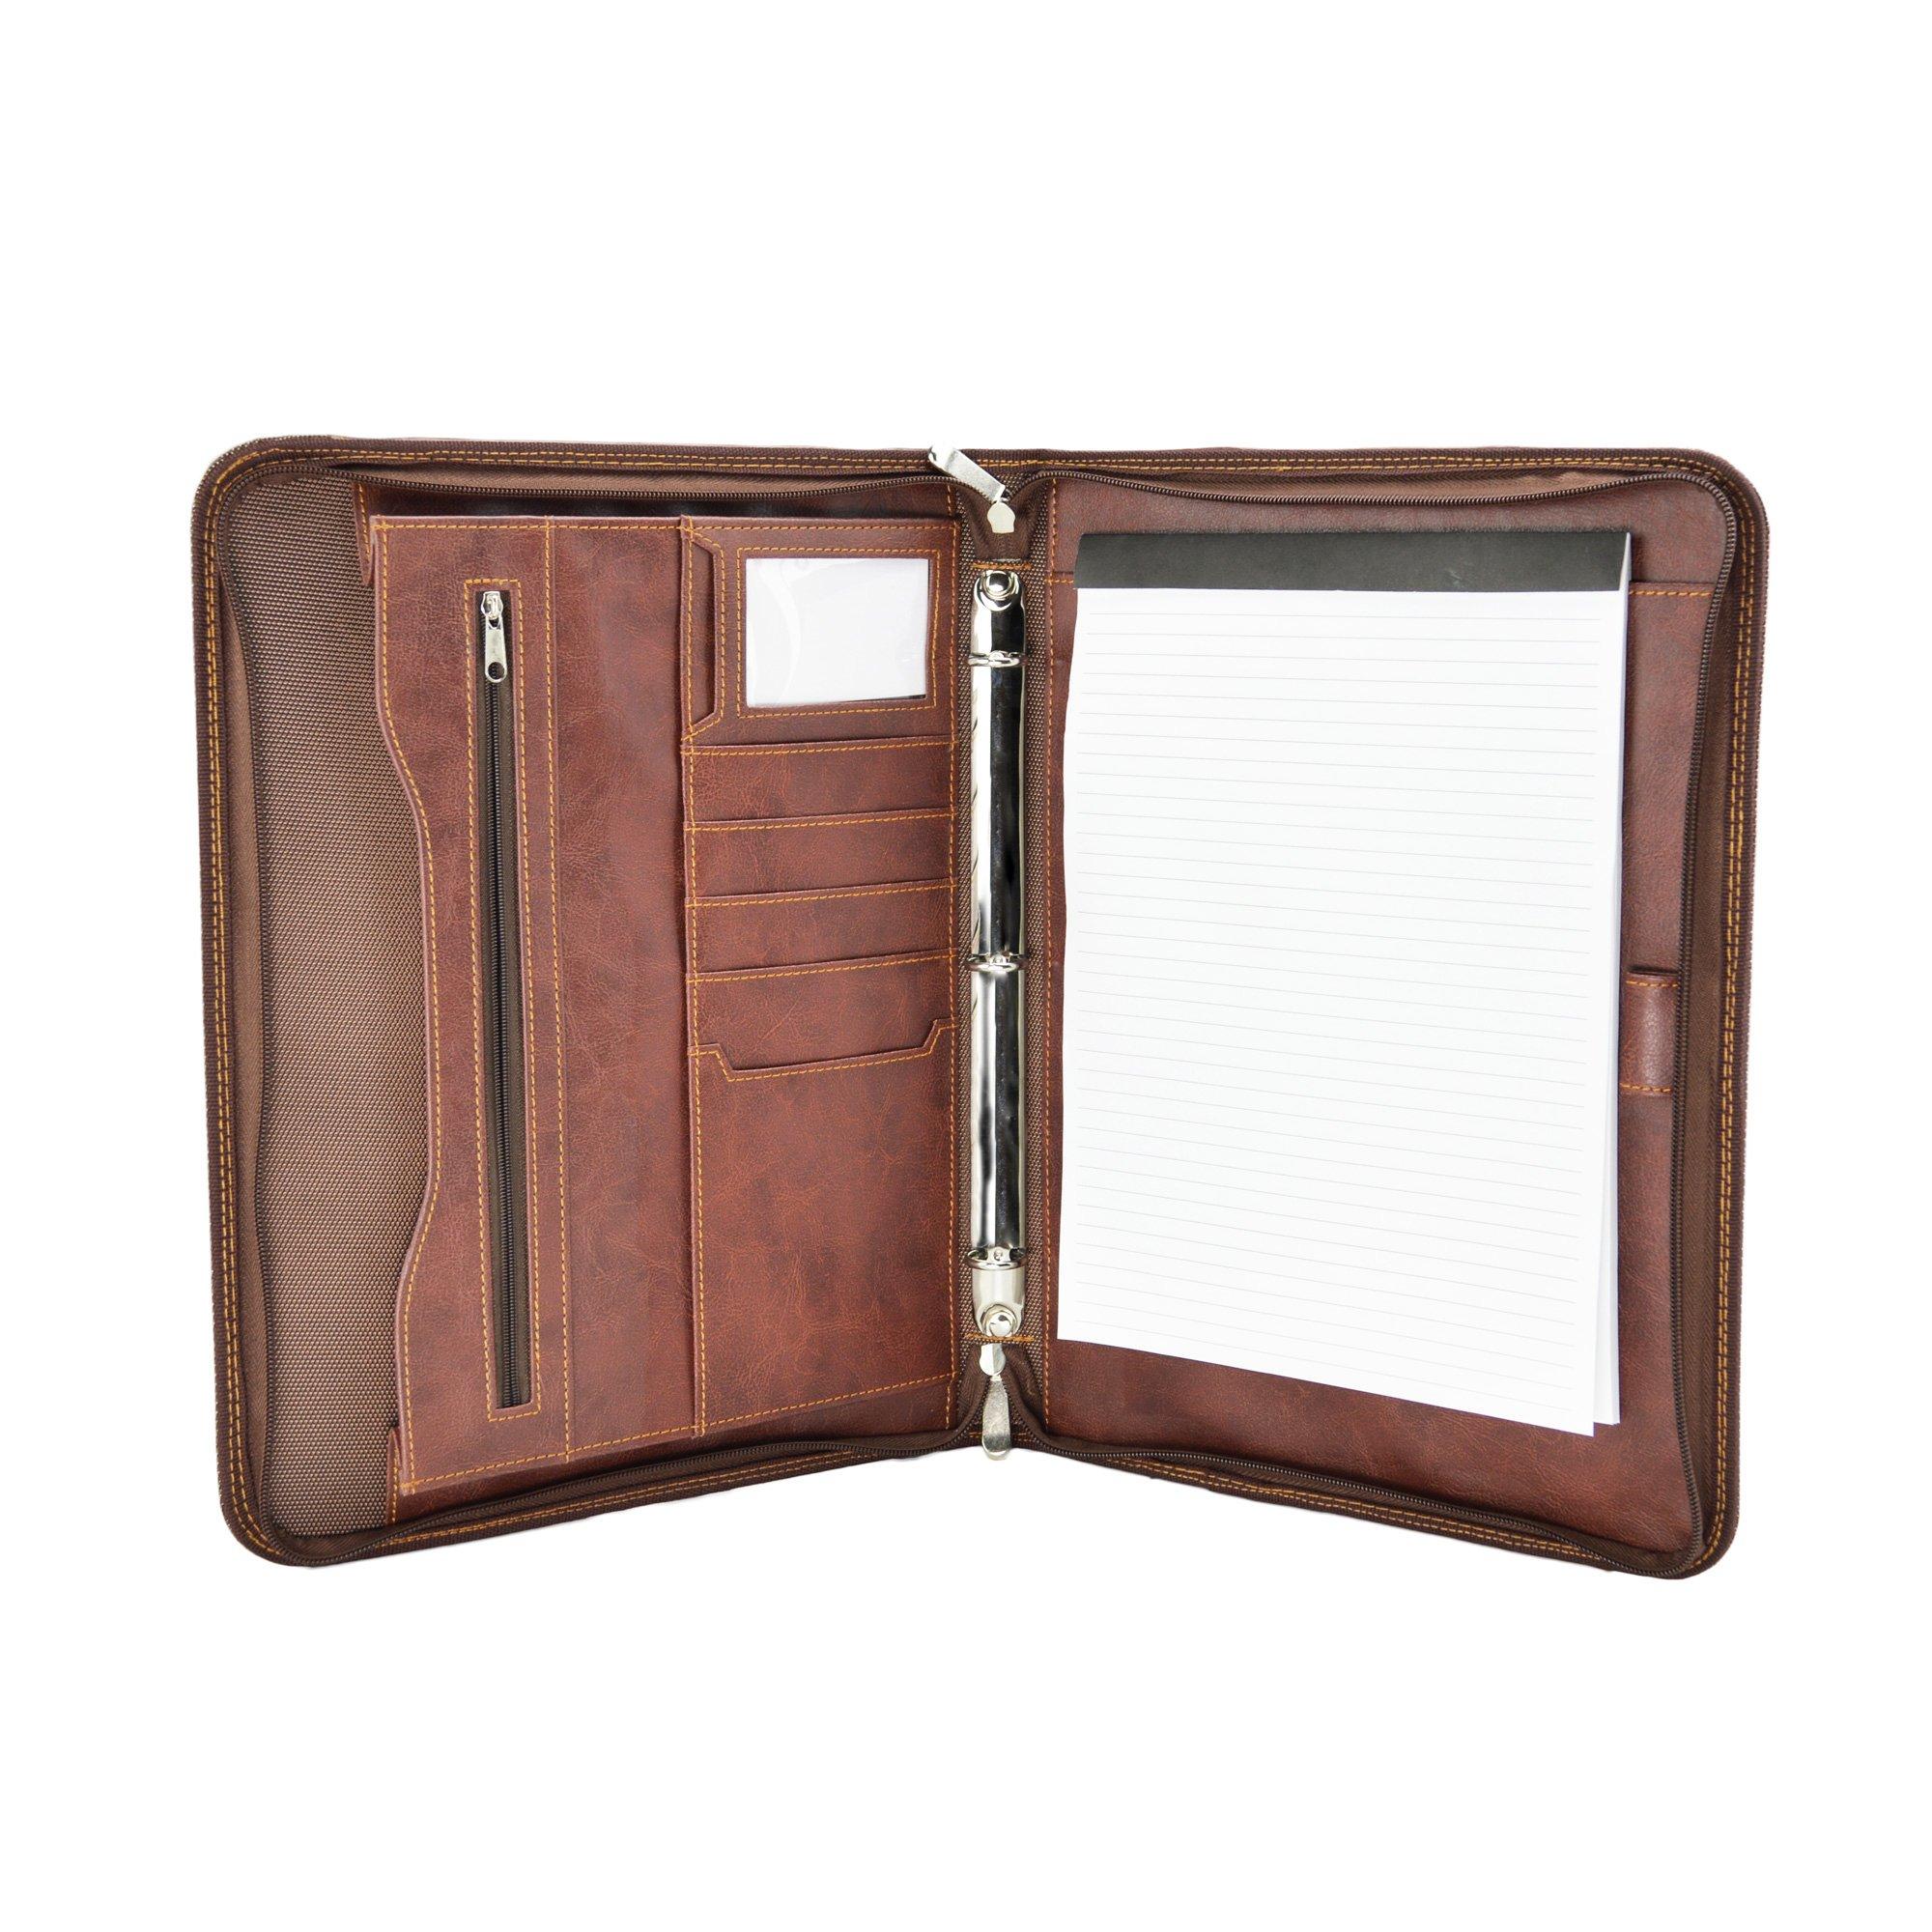 DALIX OG-EXL-001-Brown Professional Excel Business Slim Portfolio Briefcase Organizer, Brown